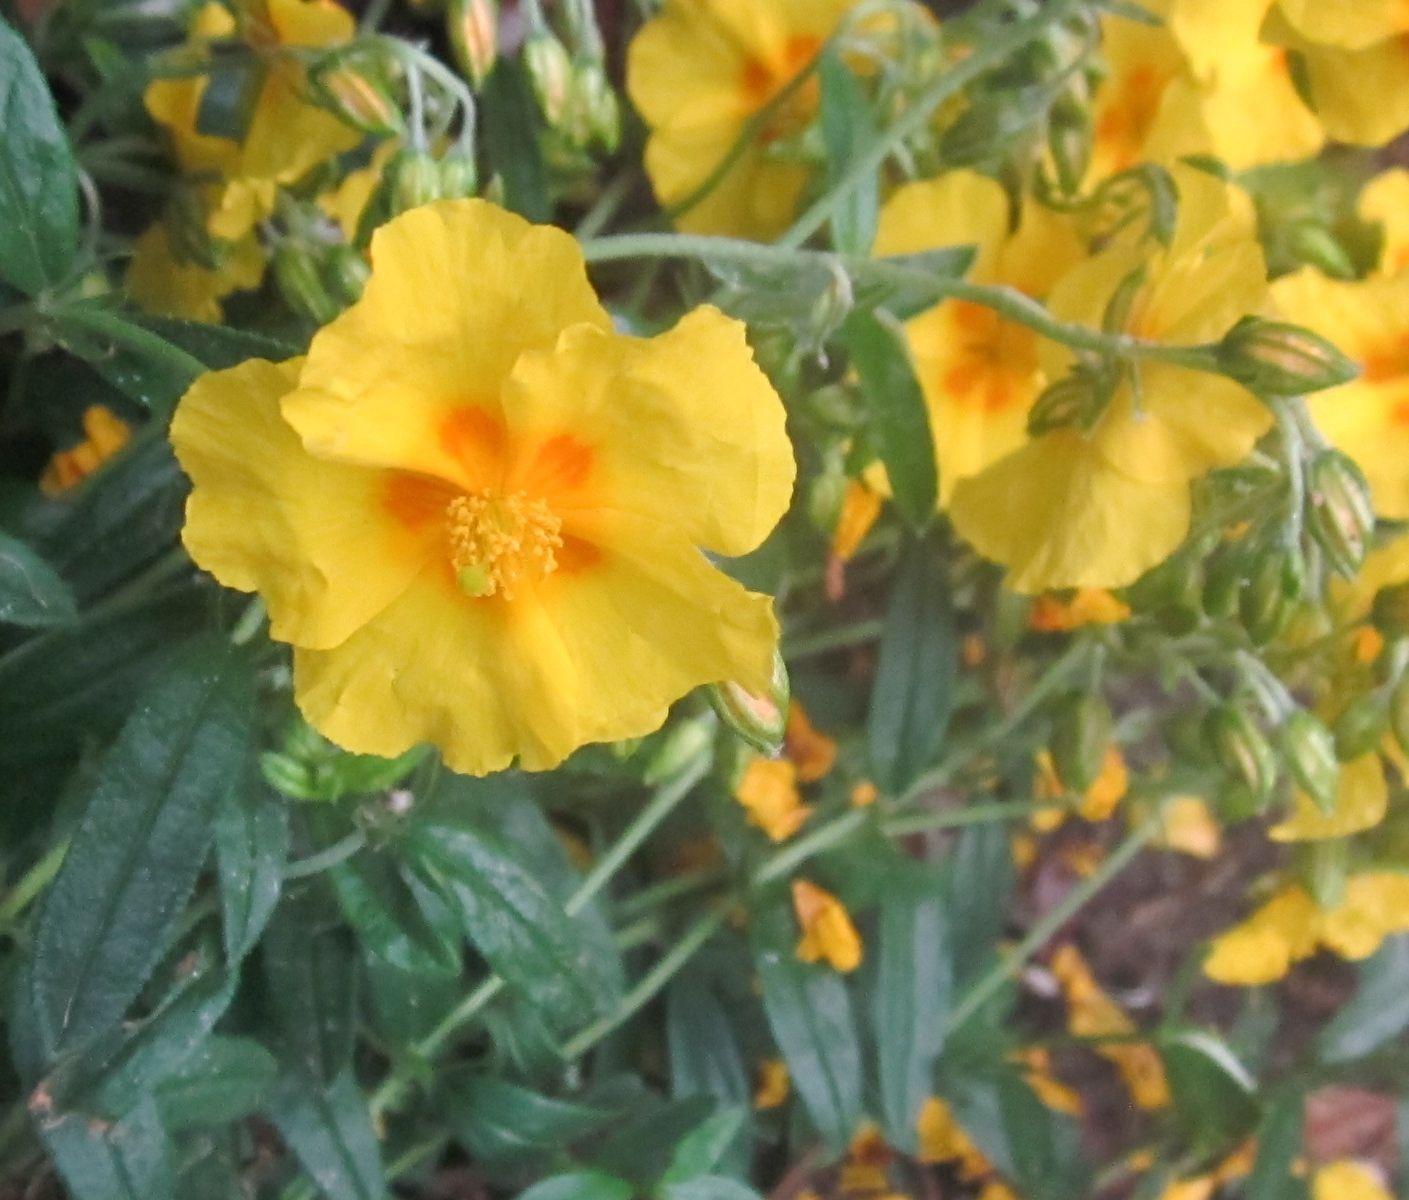 yellow rock-rose   Retaining wall garden in front   Pinterest ...